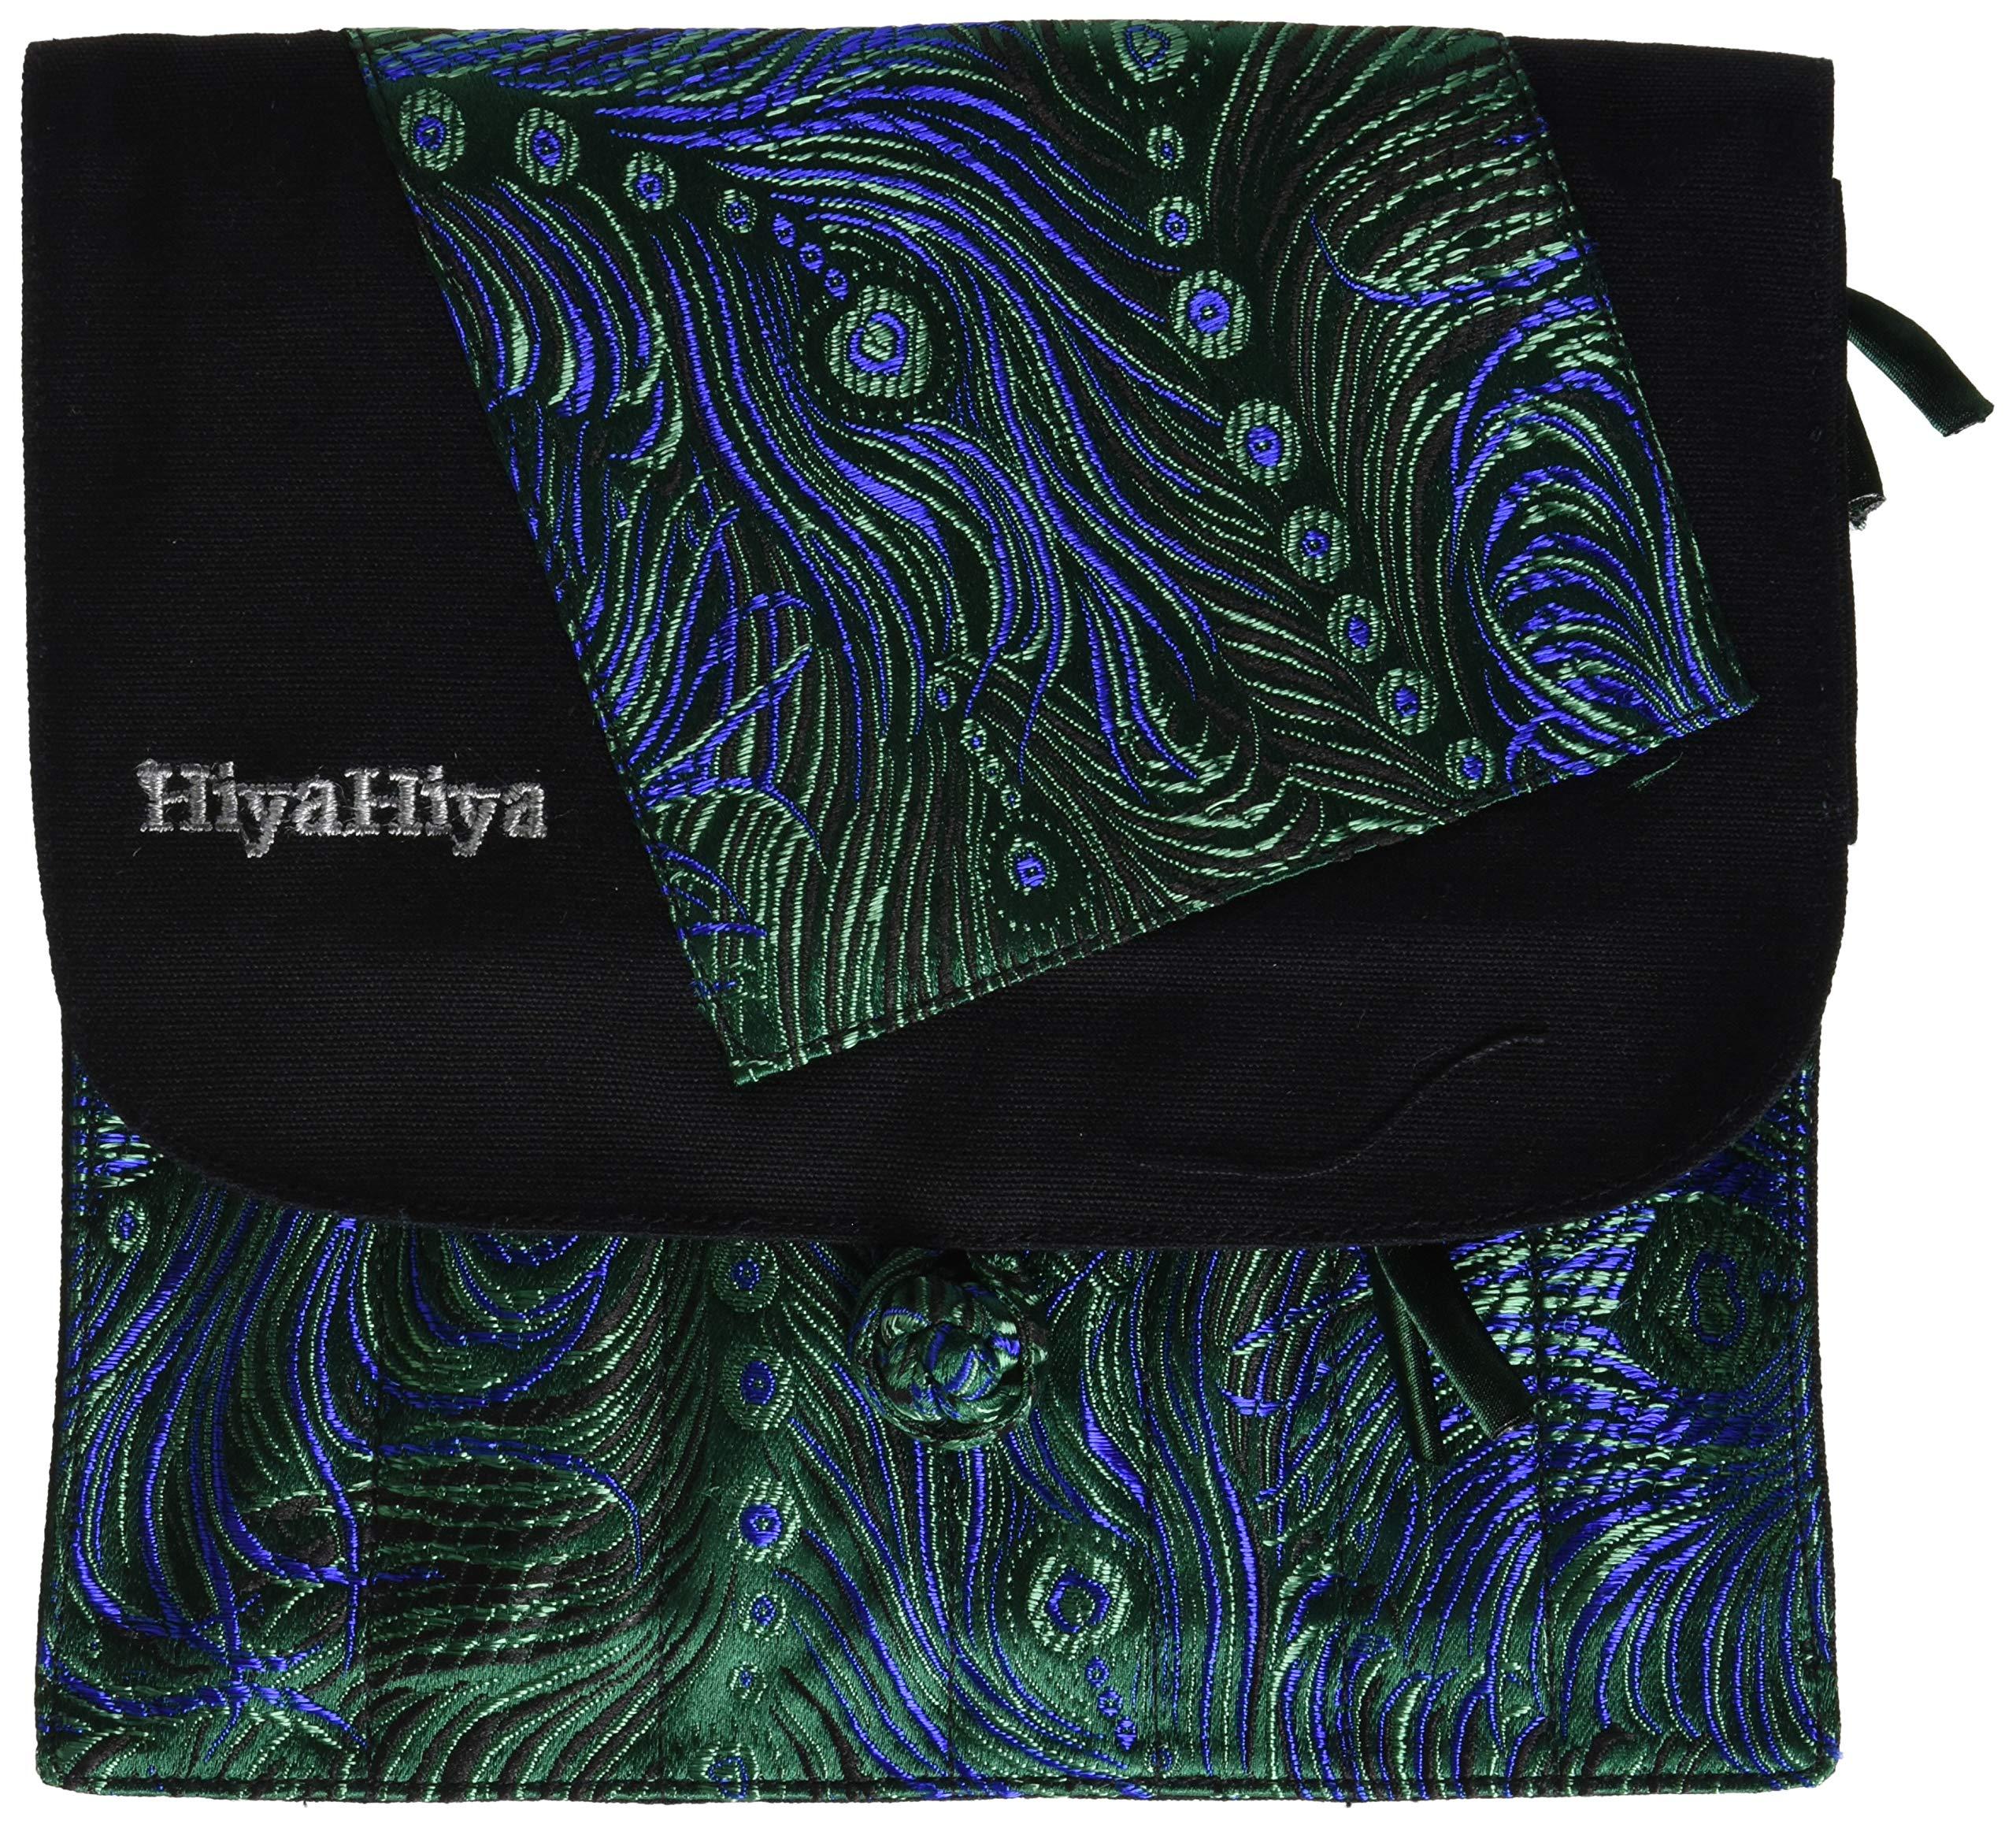 HiyaHiya ,Set de Agujas para Tejer, Acero Inoxidable, 5